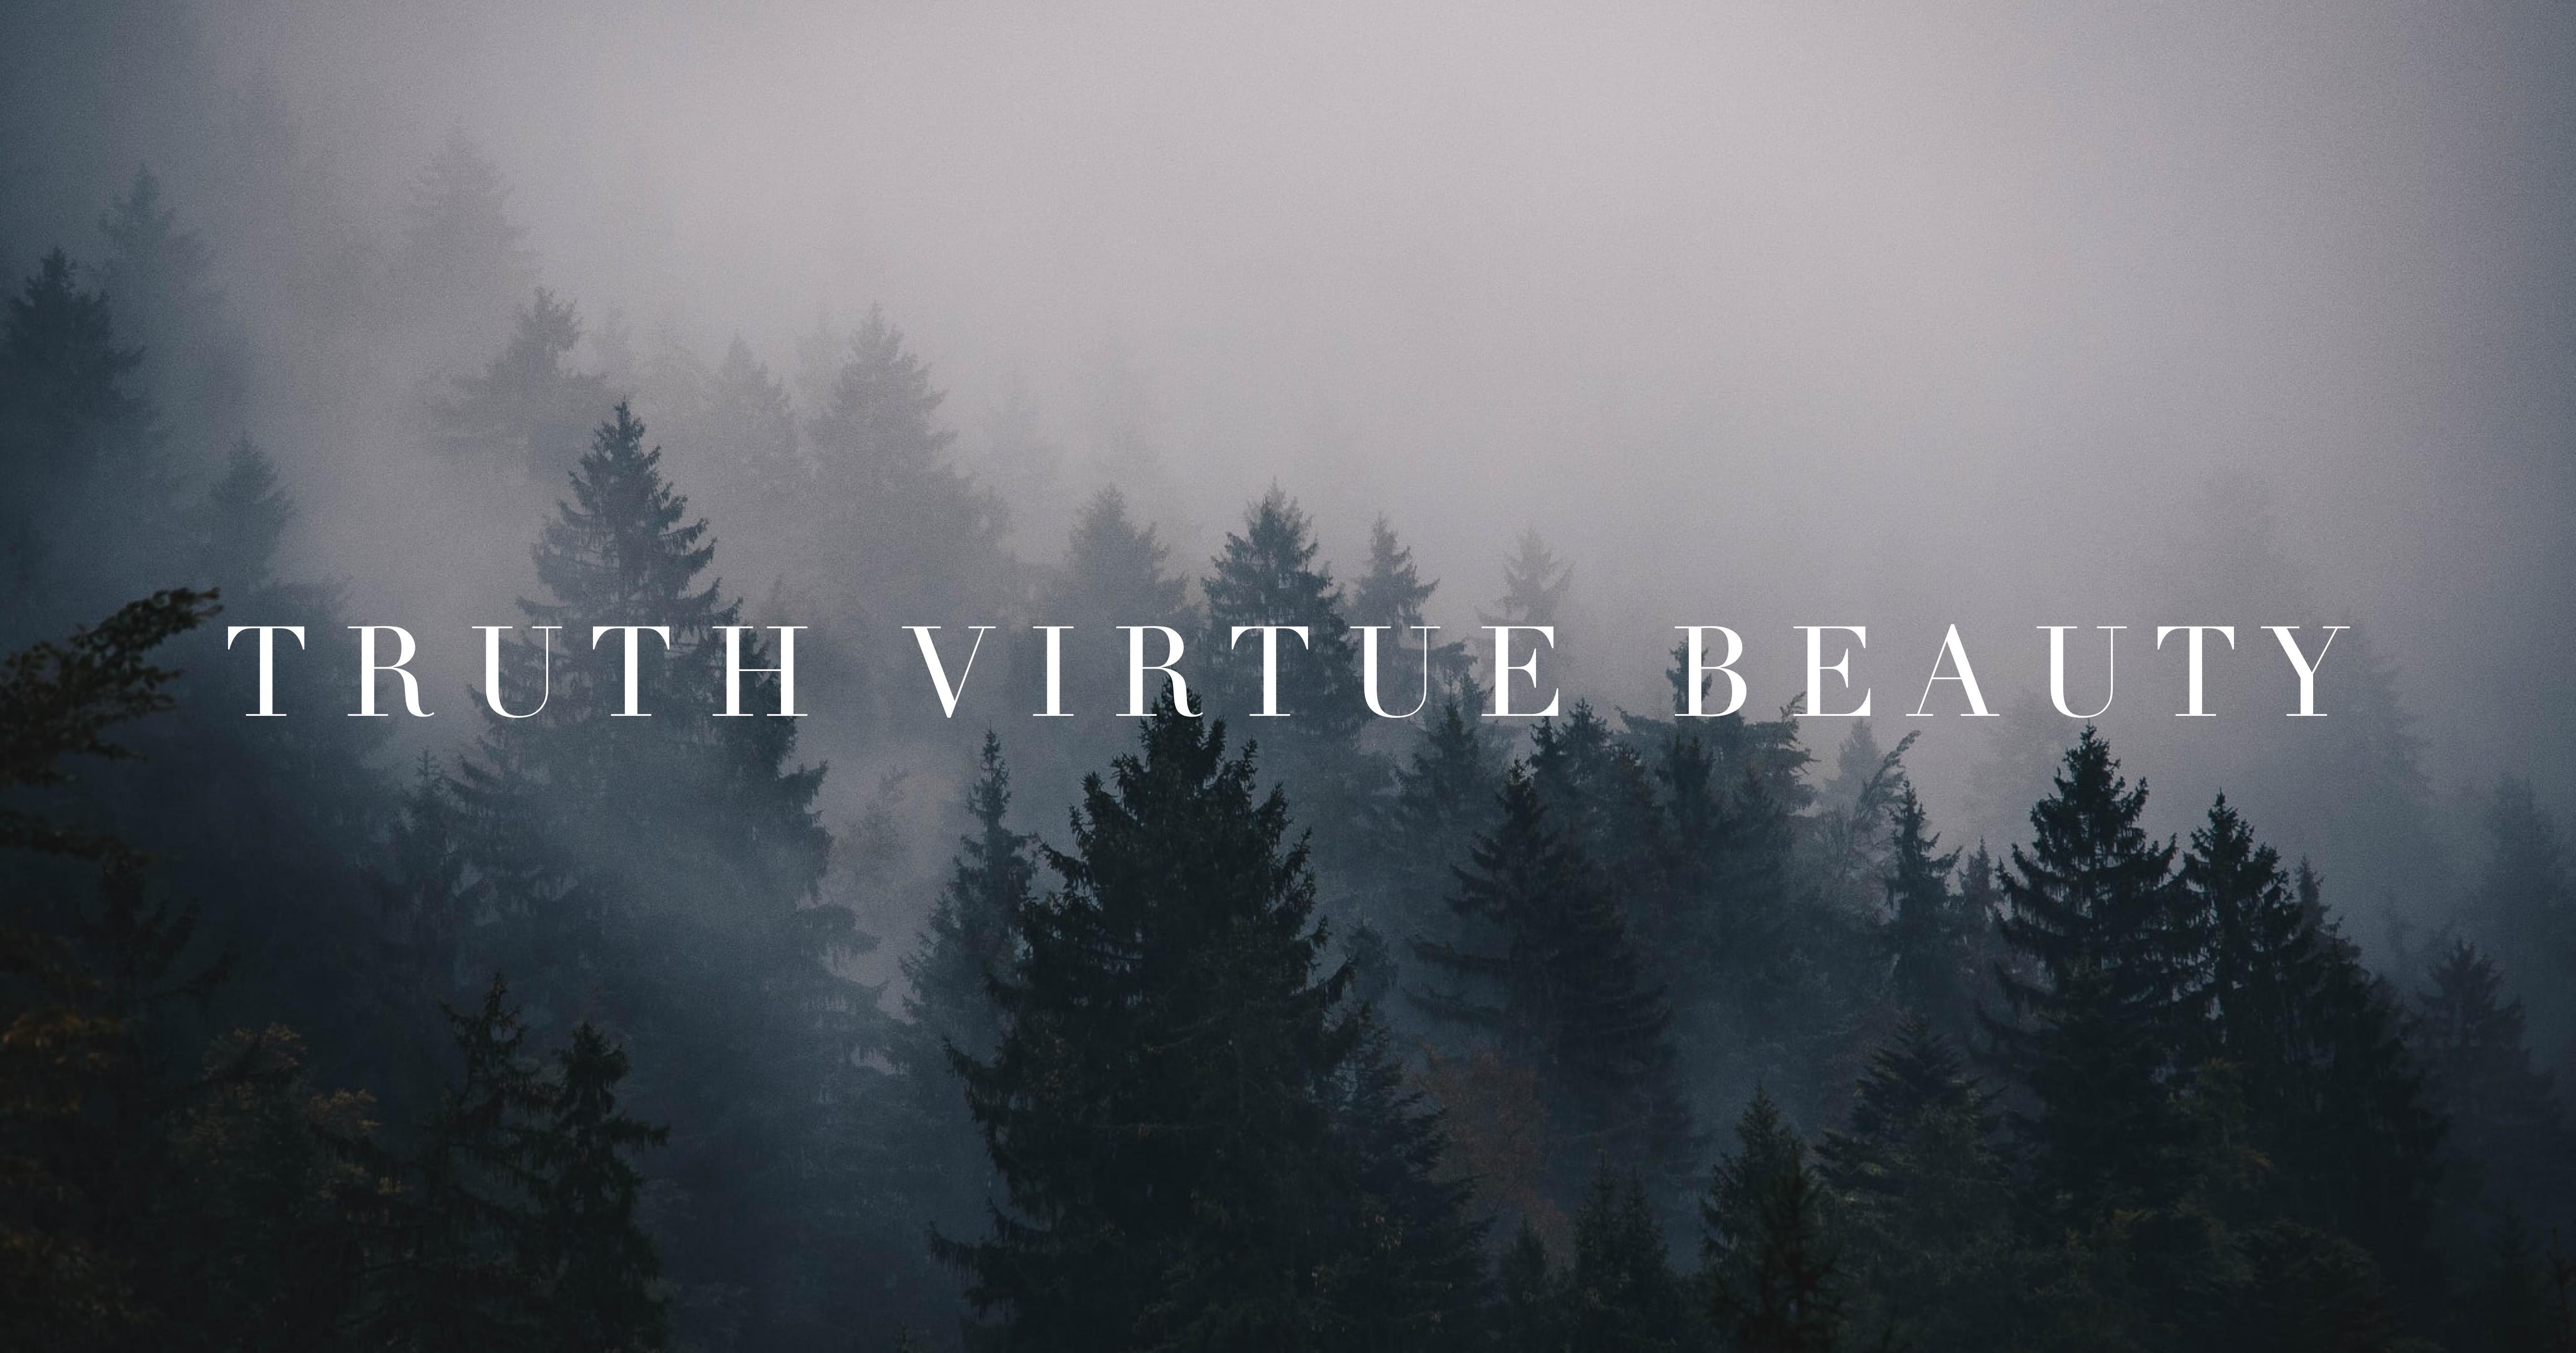 truth virtue beauty